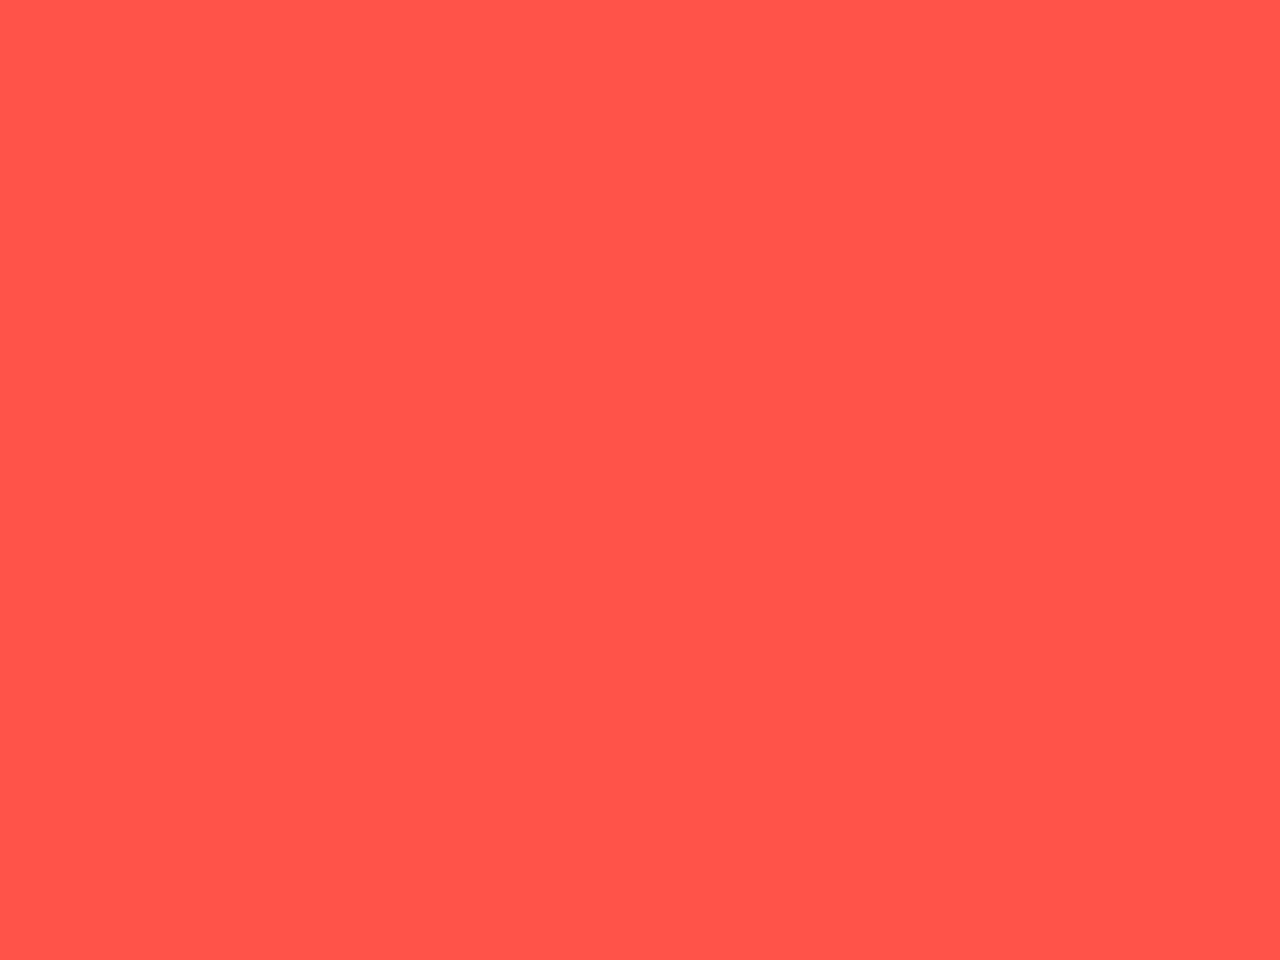 1280x960 Red-orange Solid Color Background